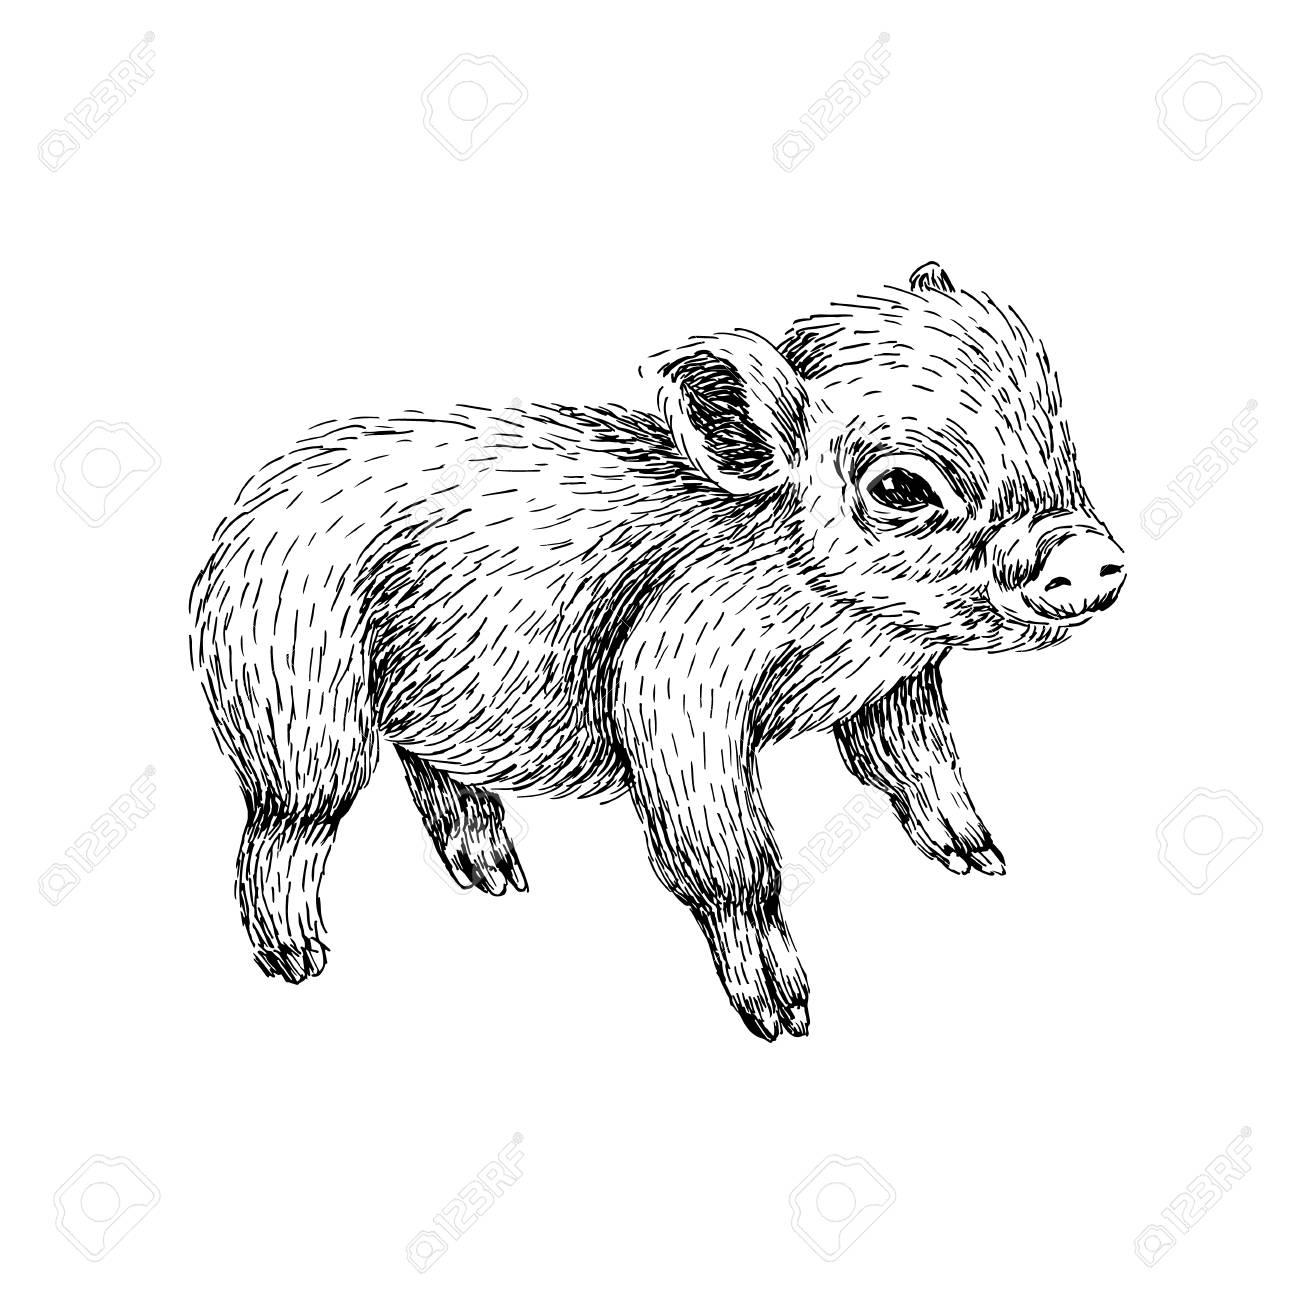 Baby Farm Animal  Domestic Little Pig  Hand Drawn Sketch Line